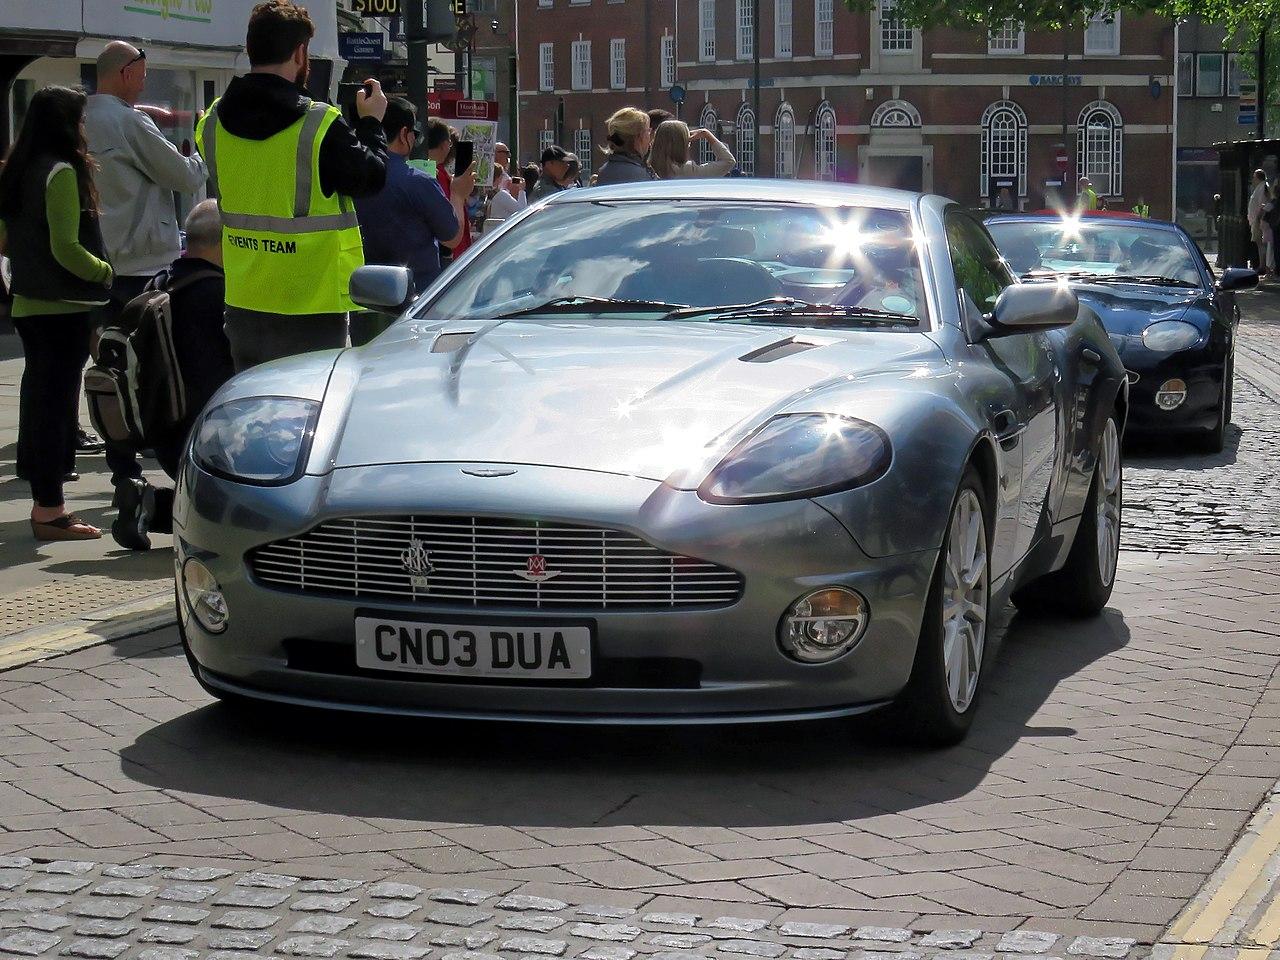 File 2003 Aston Martin V12 Vanquish 5935 Cc 5935 Cc At Horsham English Festival 2018 Jpg Wikimedia Commons